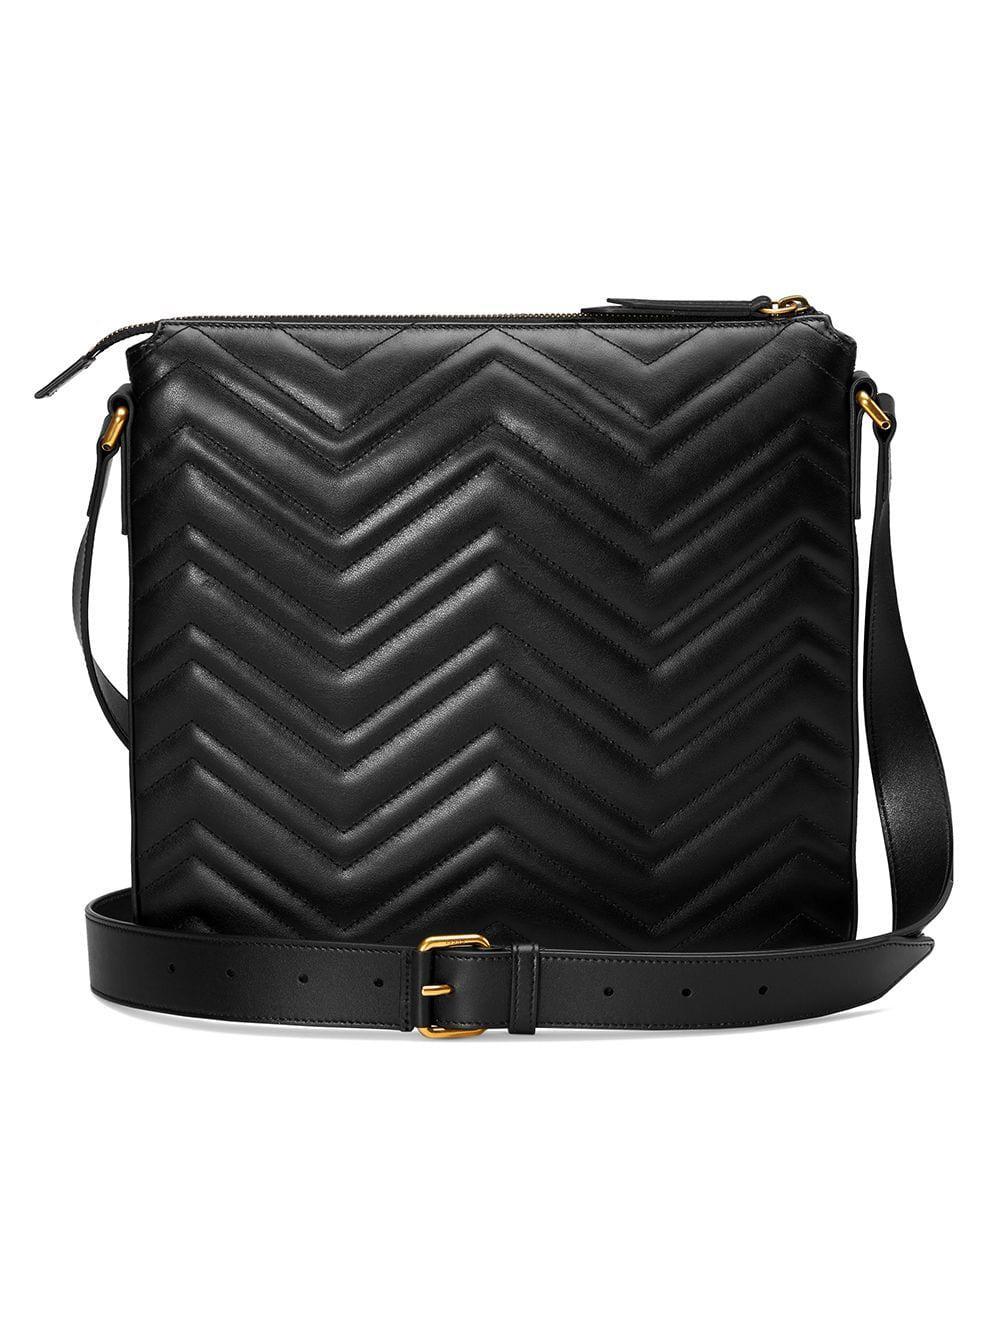 Gucci - Black GG Marmont Messenger Bag for Men - Lyst. View fullscreen 56d8e4f547117